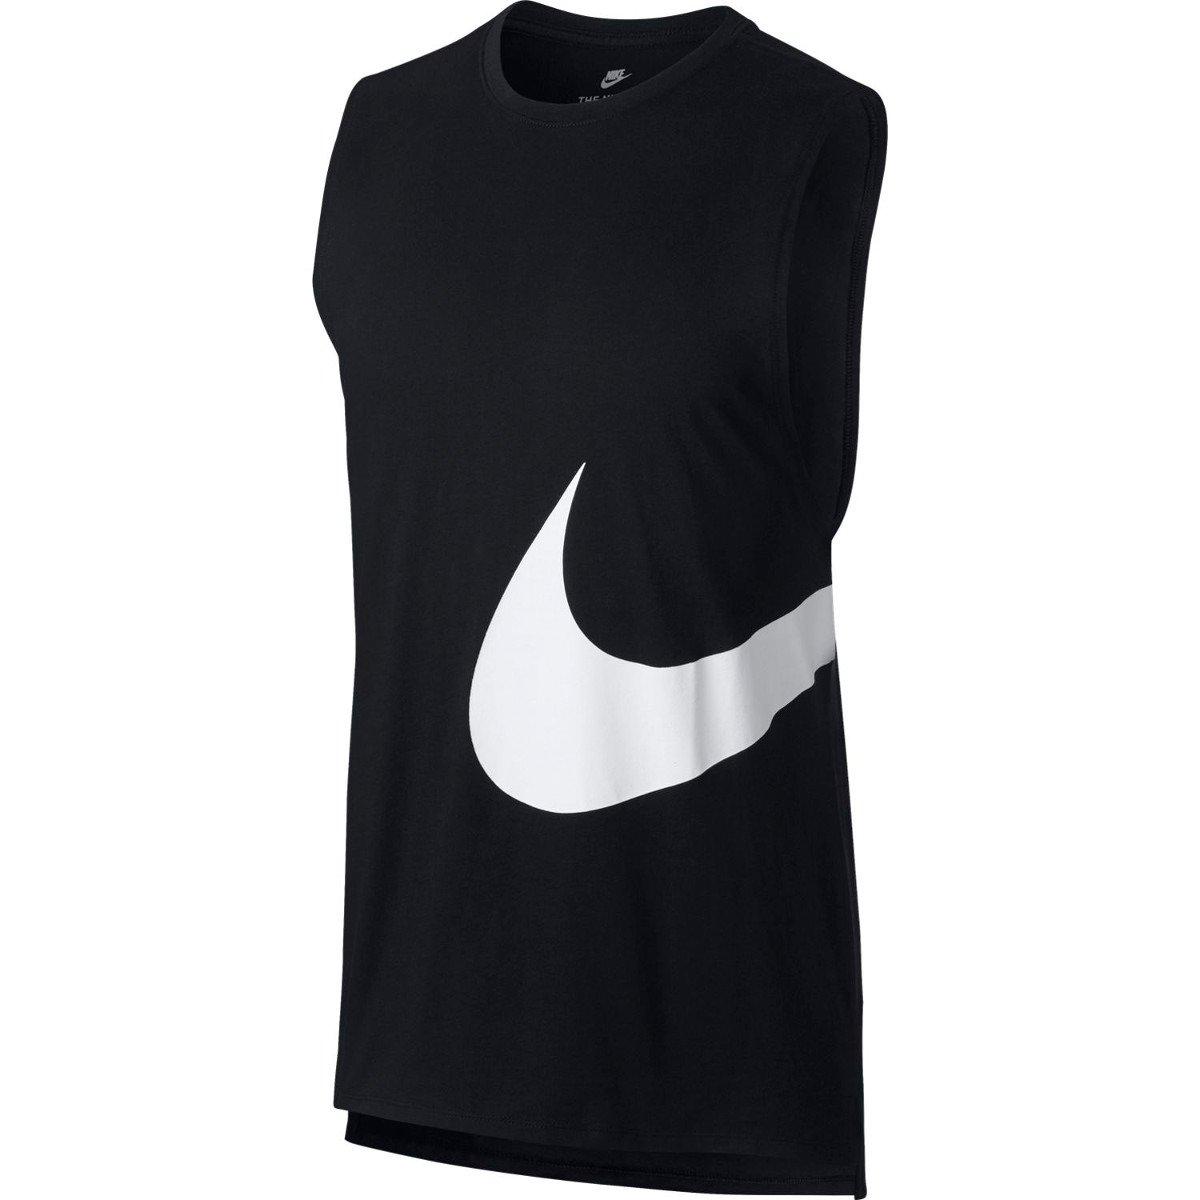 3a4d195e295898 Koszulka męska Nike Hybrid Swoosh 847681-010 czarna | Sklep ...